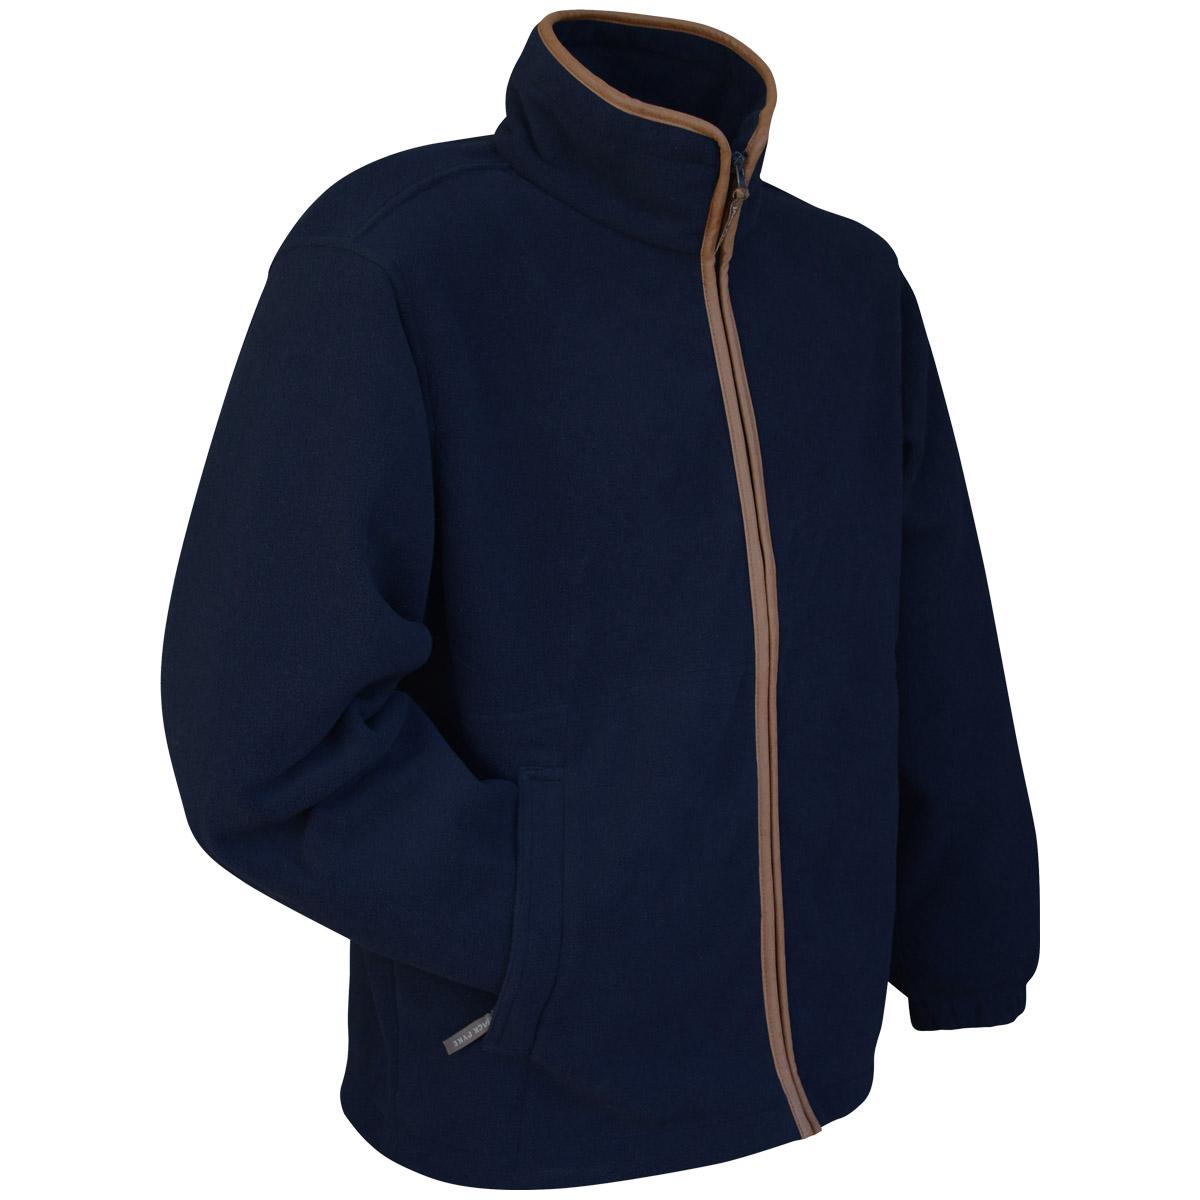 Jack Pyke Countryman Fleece Gillet: Jack Pyke Countryman Fleece Jacket Navy